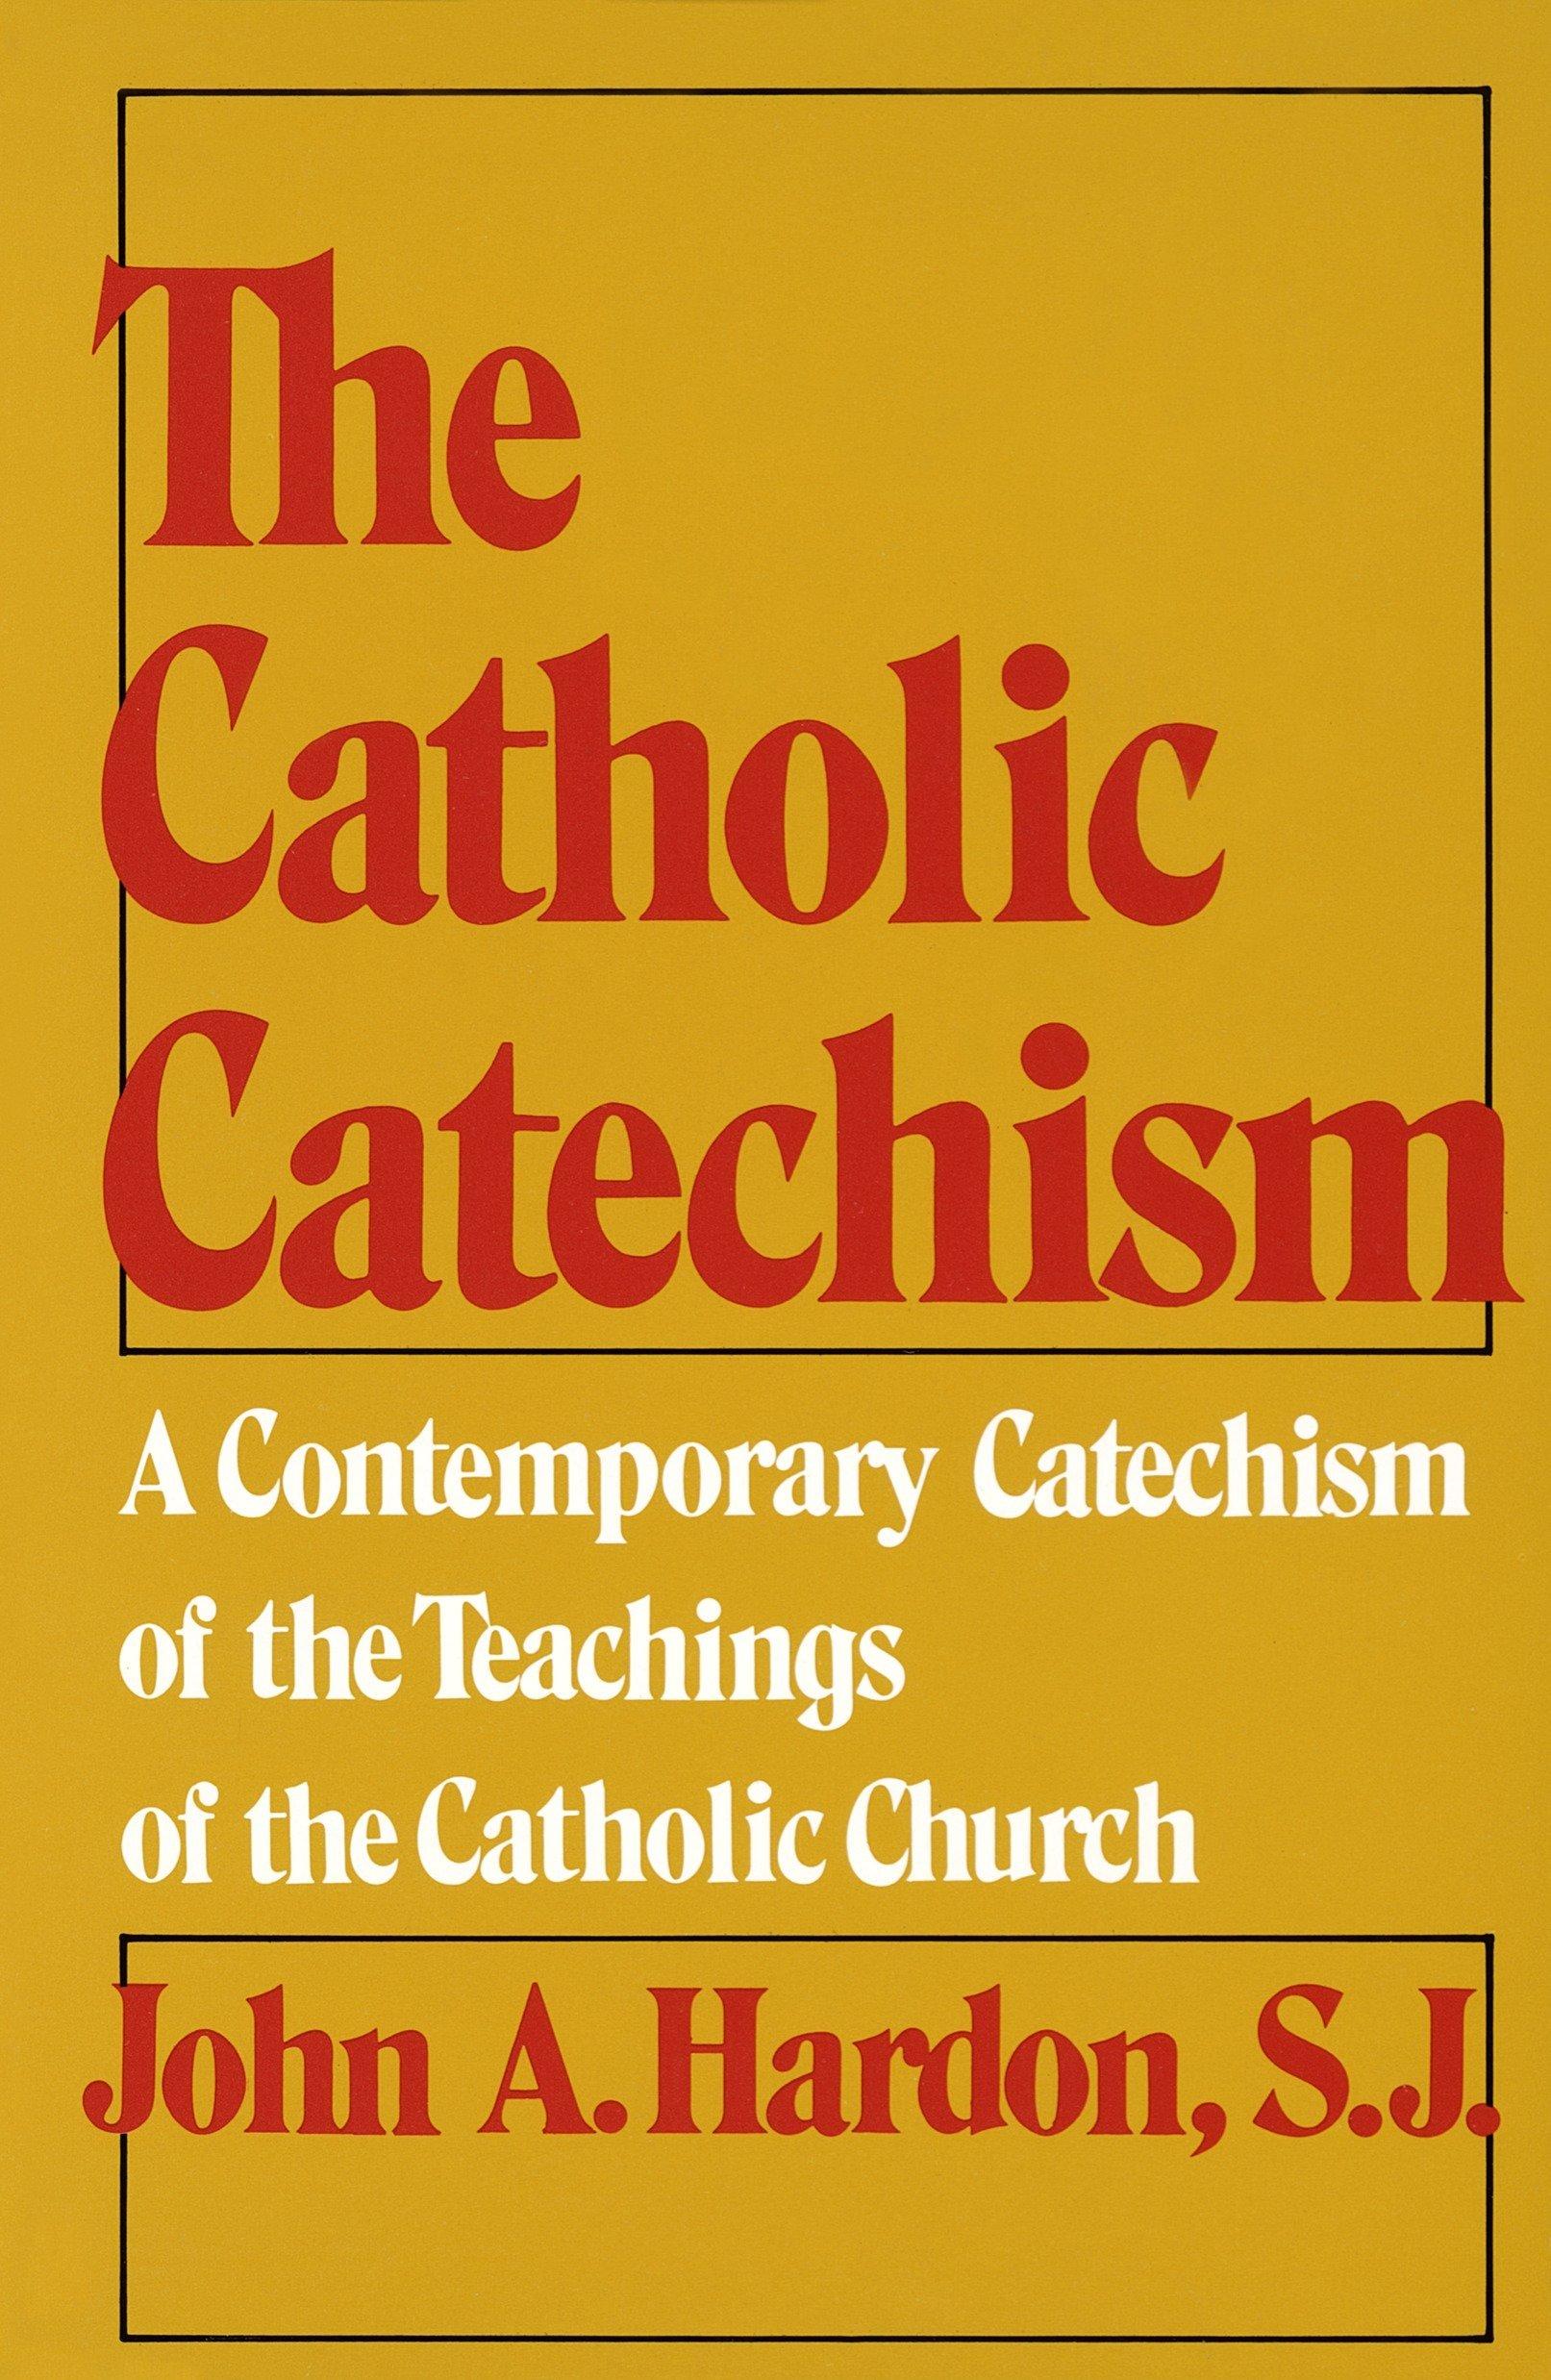 The Catholic Catechism: A Contemporary Catechism of the Teachings of the Catholic  Church: John A. Hardon: 9780385080453: Amazon.com: Books